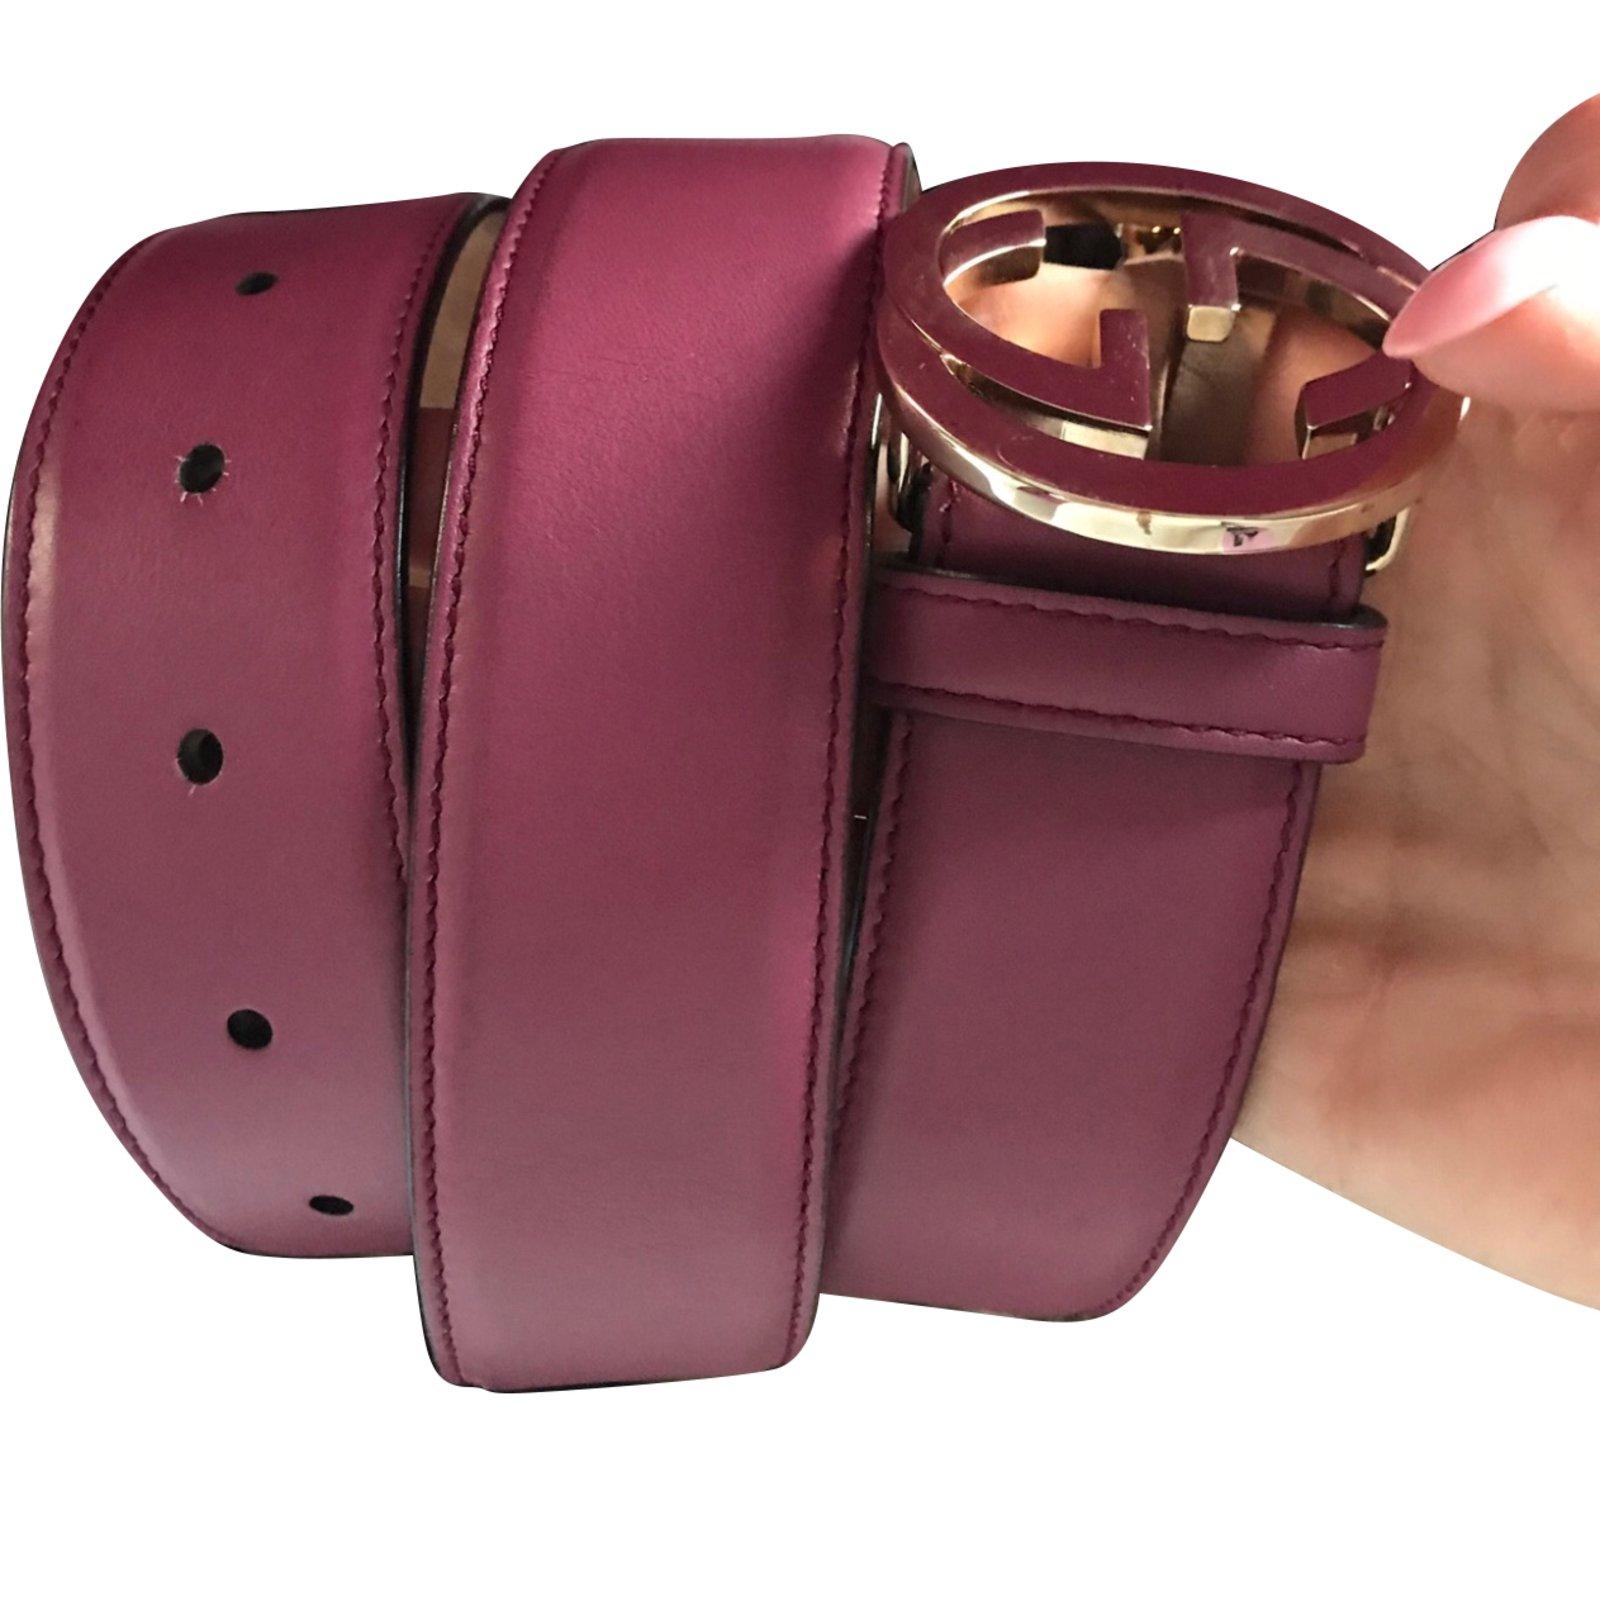 c48df5b84 Gucci Belts Belts Leather Pink ref.61671 - Joli Closet